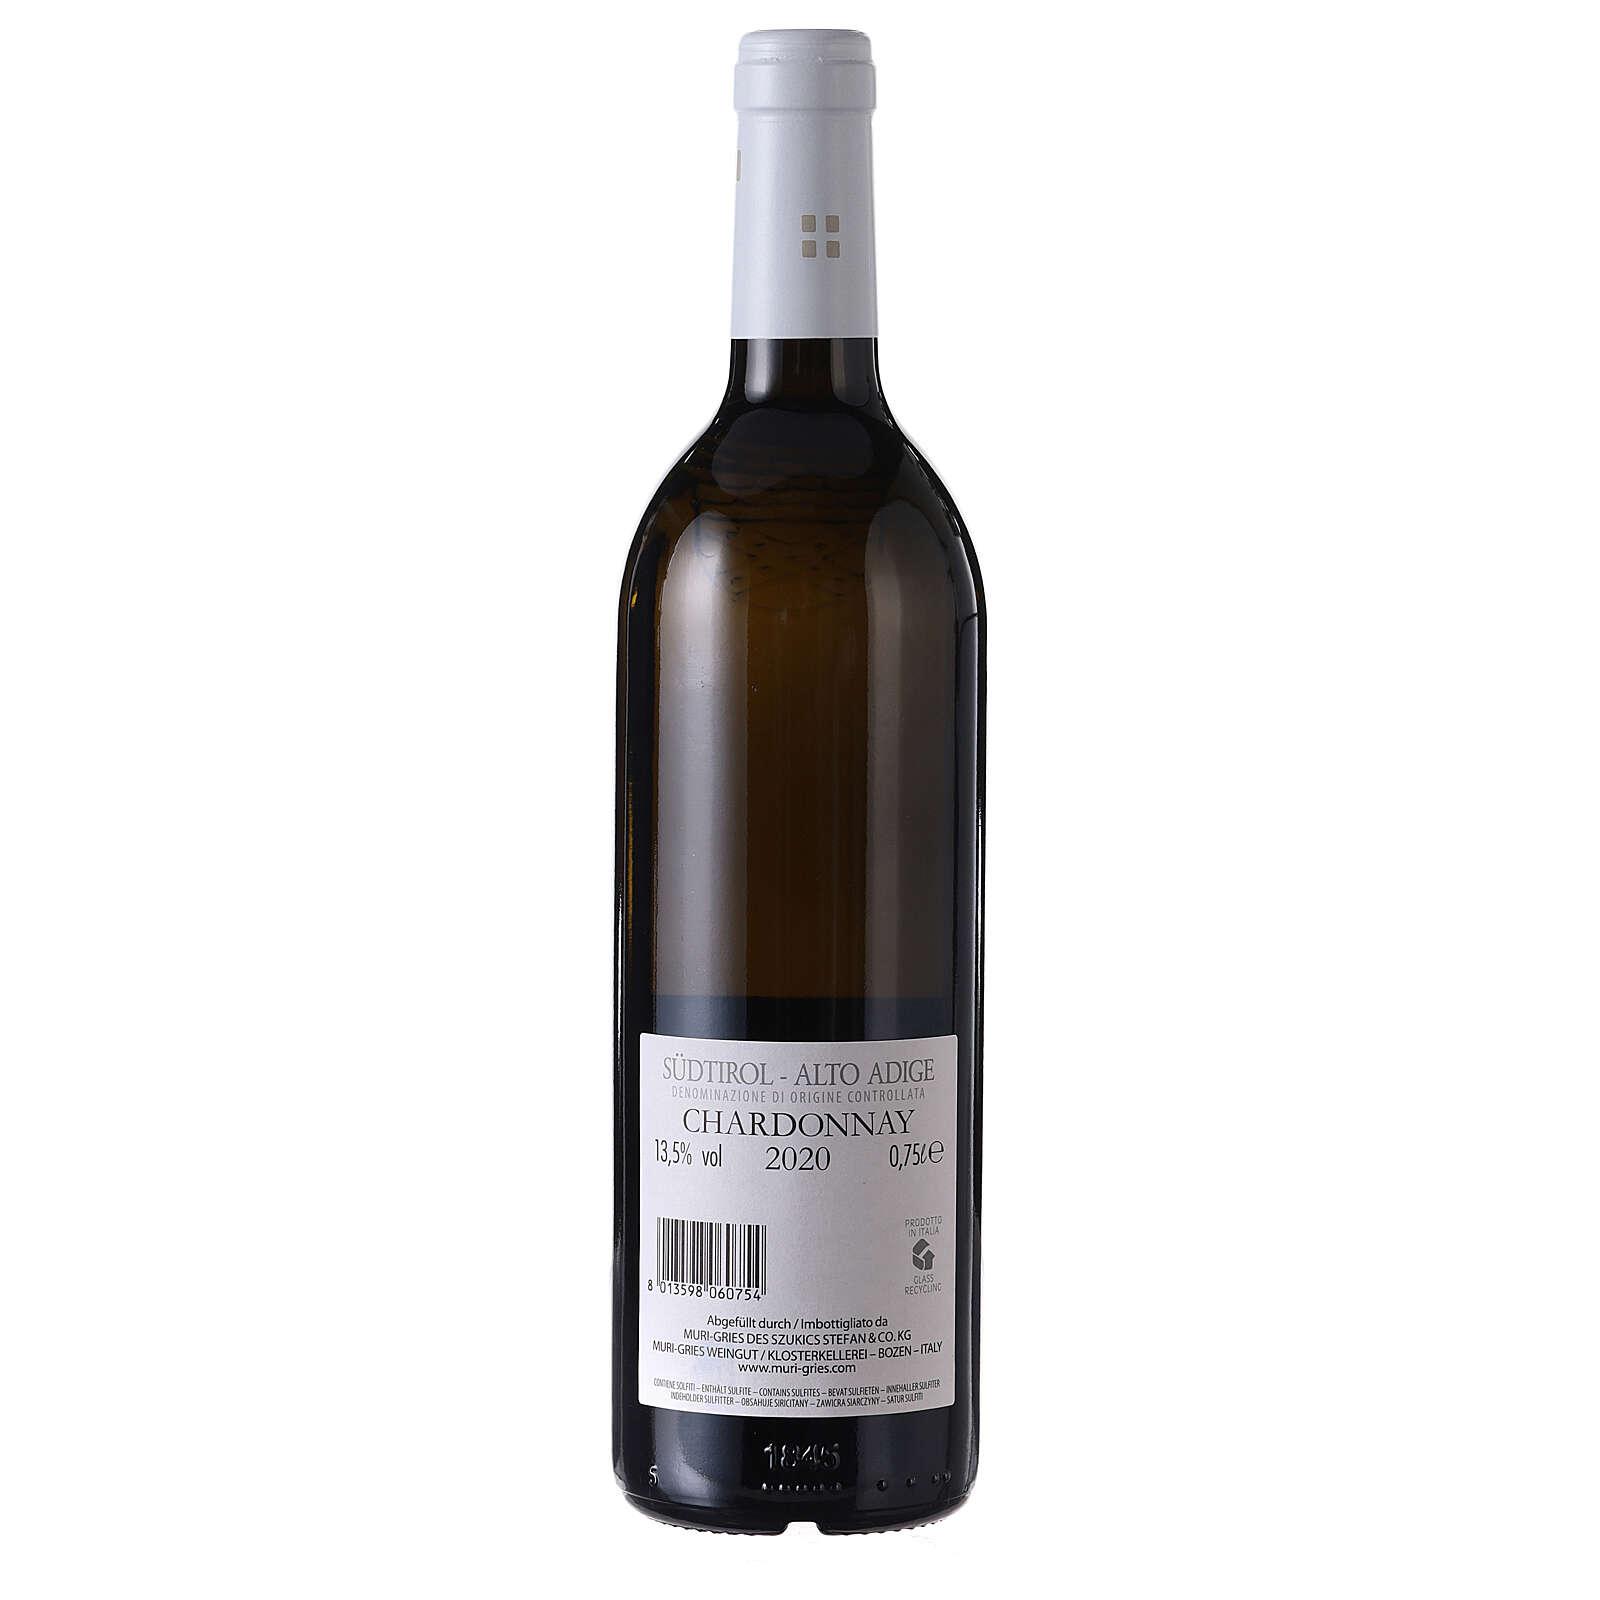 Weisswein Chardonnay DOC 2020 Abtei Muri Gries 3